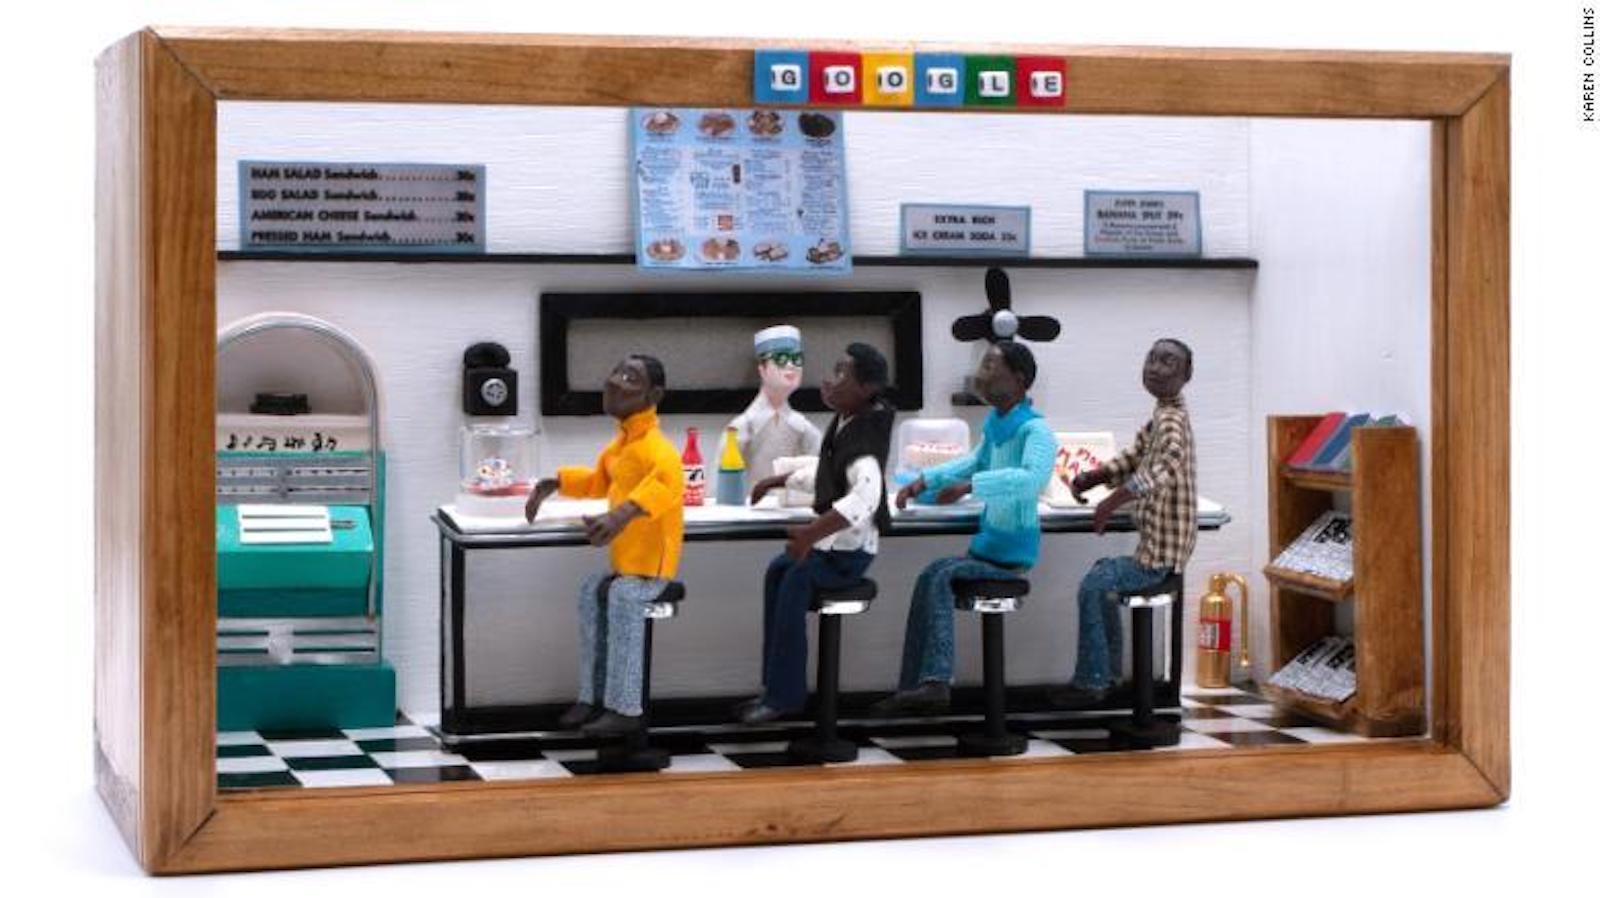 African American Miniature Museum, Karen Collins, African American History, Black History, U.S. History, American History, Racism, African American Art, Black Art, KOLUMN Magazine, KOLUMN, KINDR'D Magazine, Willoughby Avenue, Wriit,